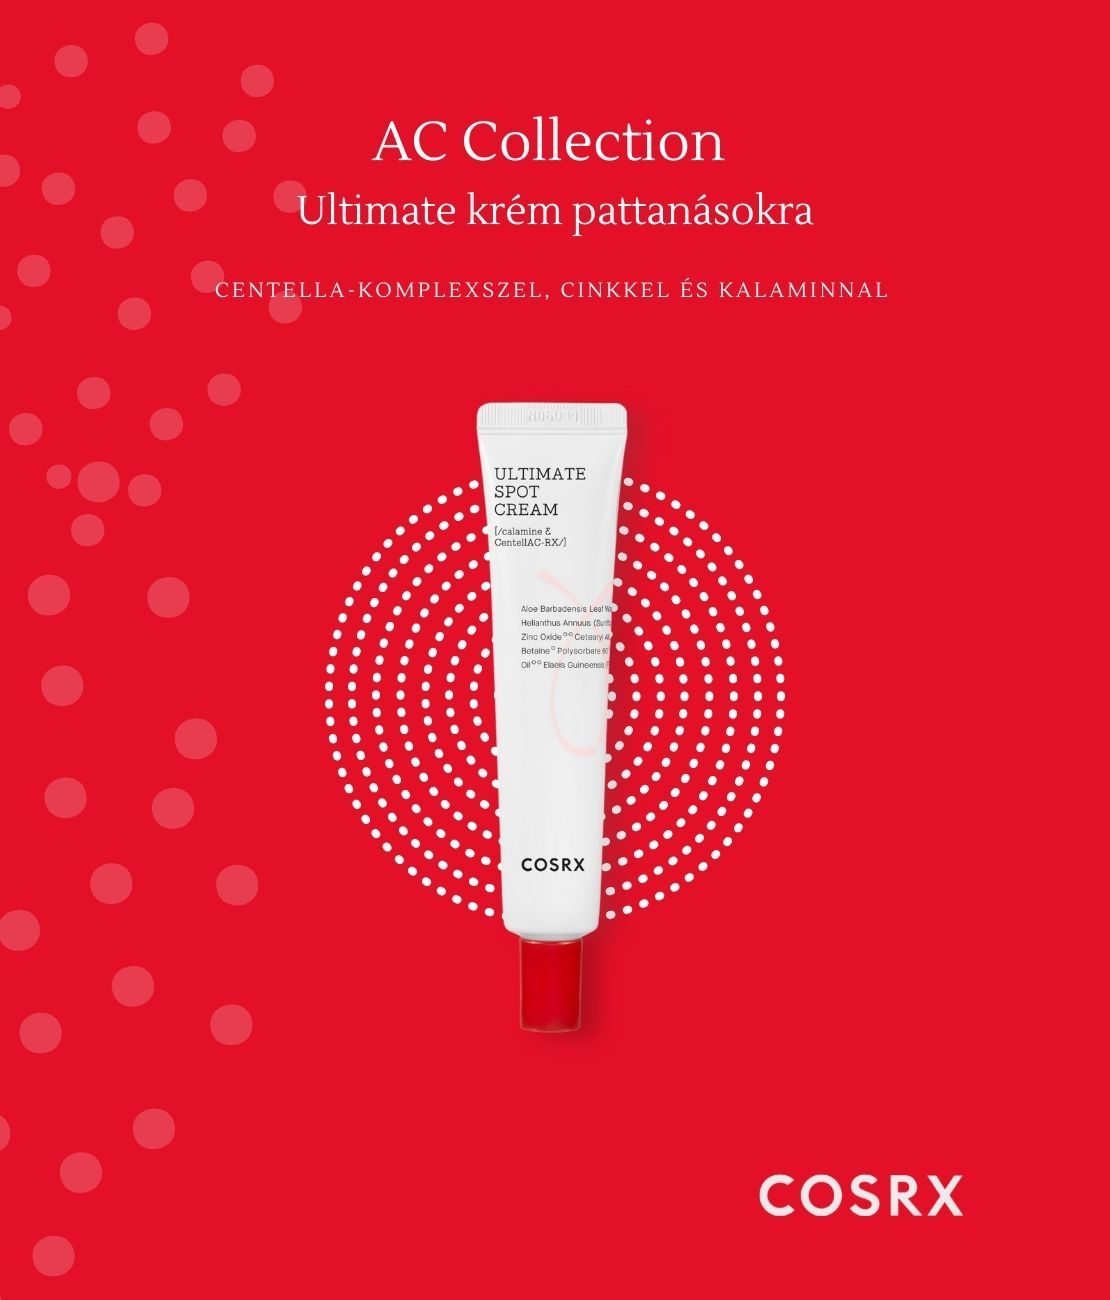 COSRX-AC-Collection-Ultimate-krem-pattanasokra-leiras-0